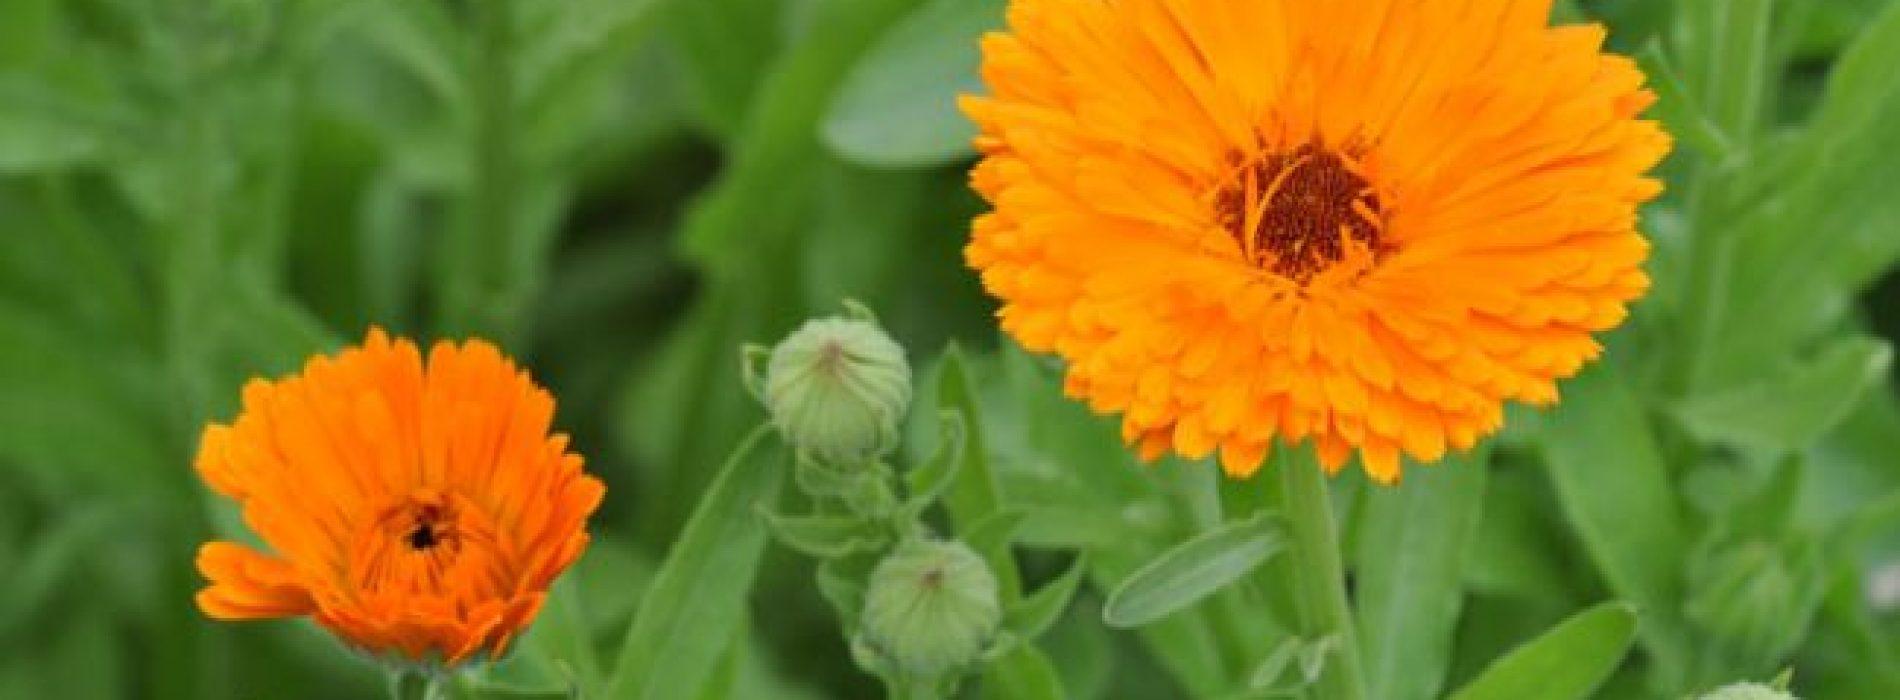 Basisbeginselen: Hoe calendula te kweken, een nuttige medicinale plant